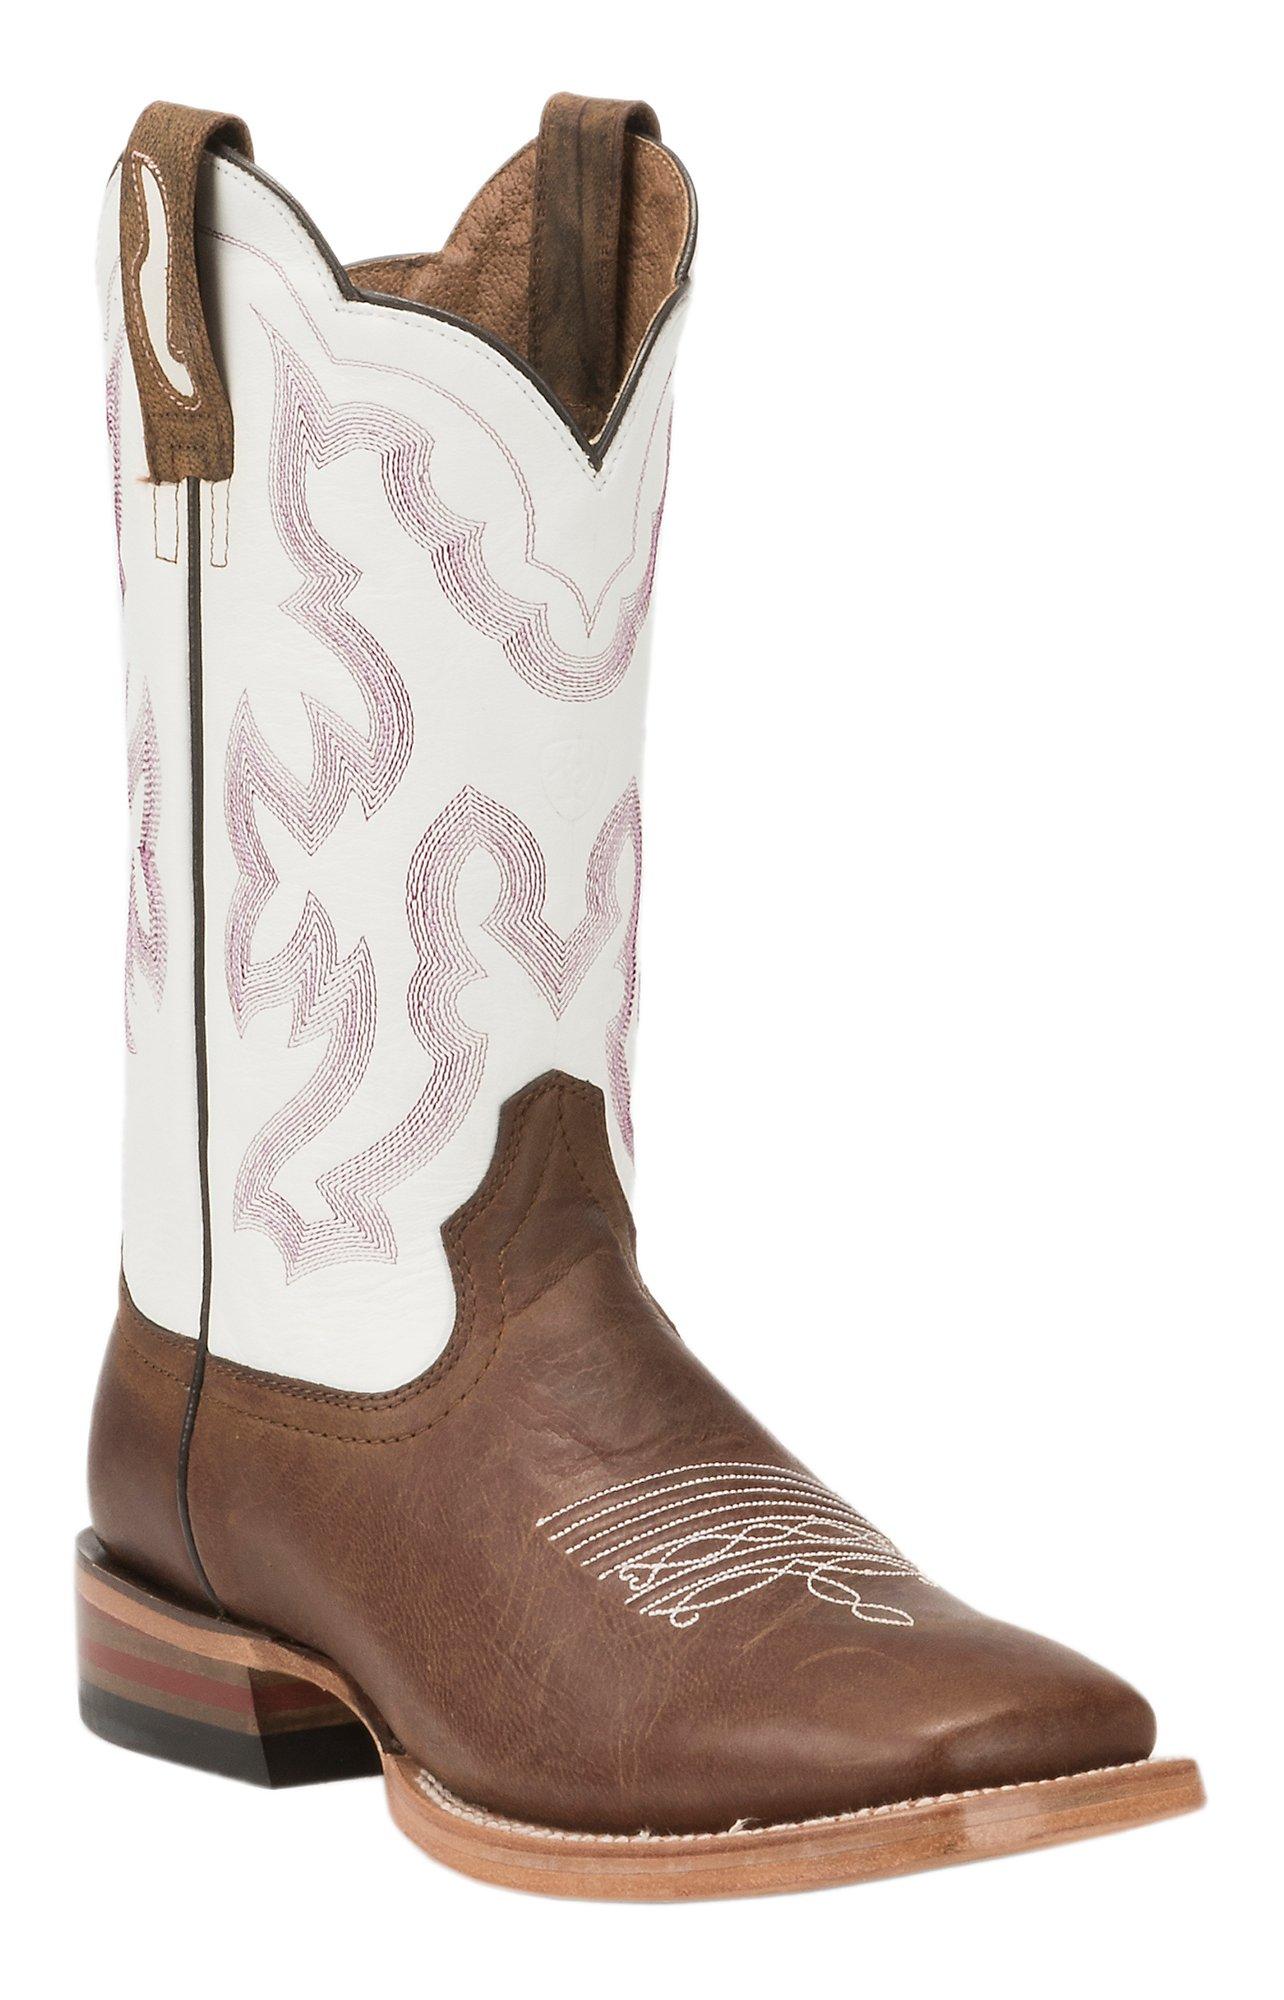 Shop Men's Cowboy Boots & Western Shoes | Free Shipping $50  ...